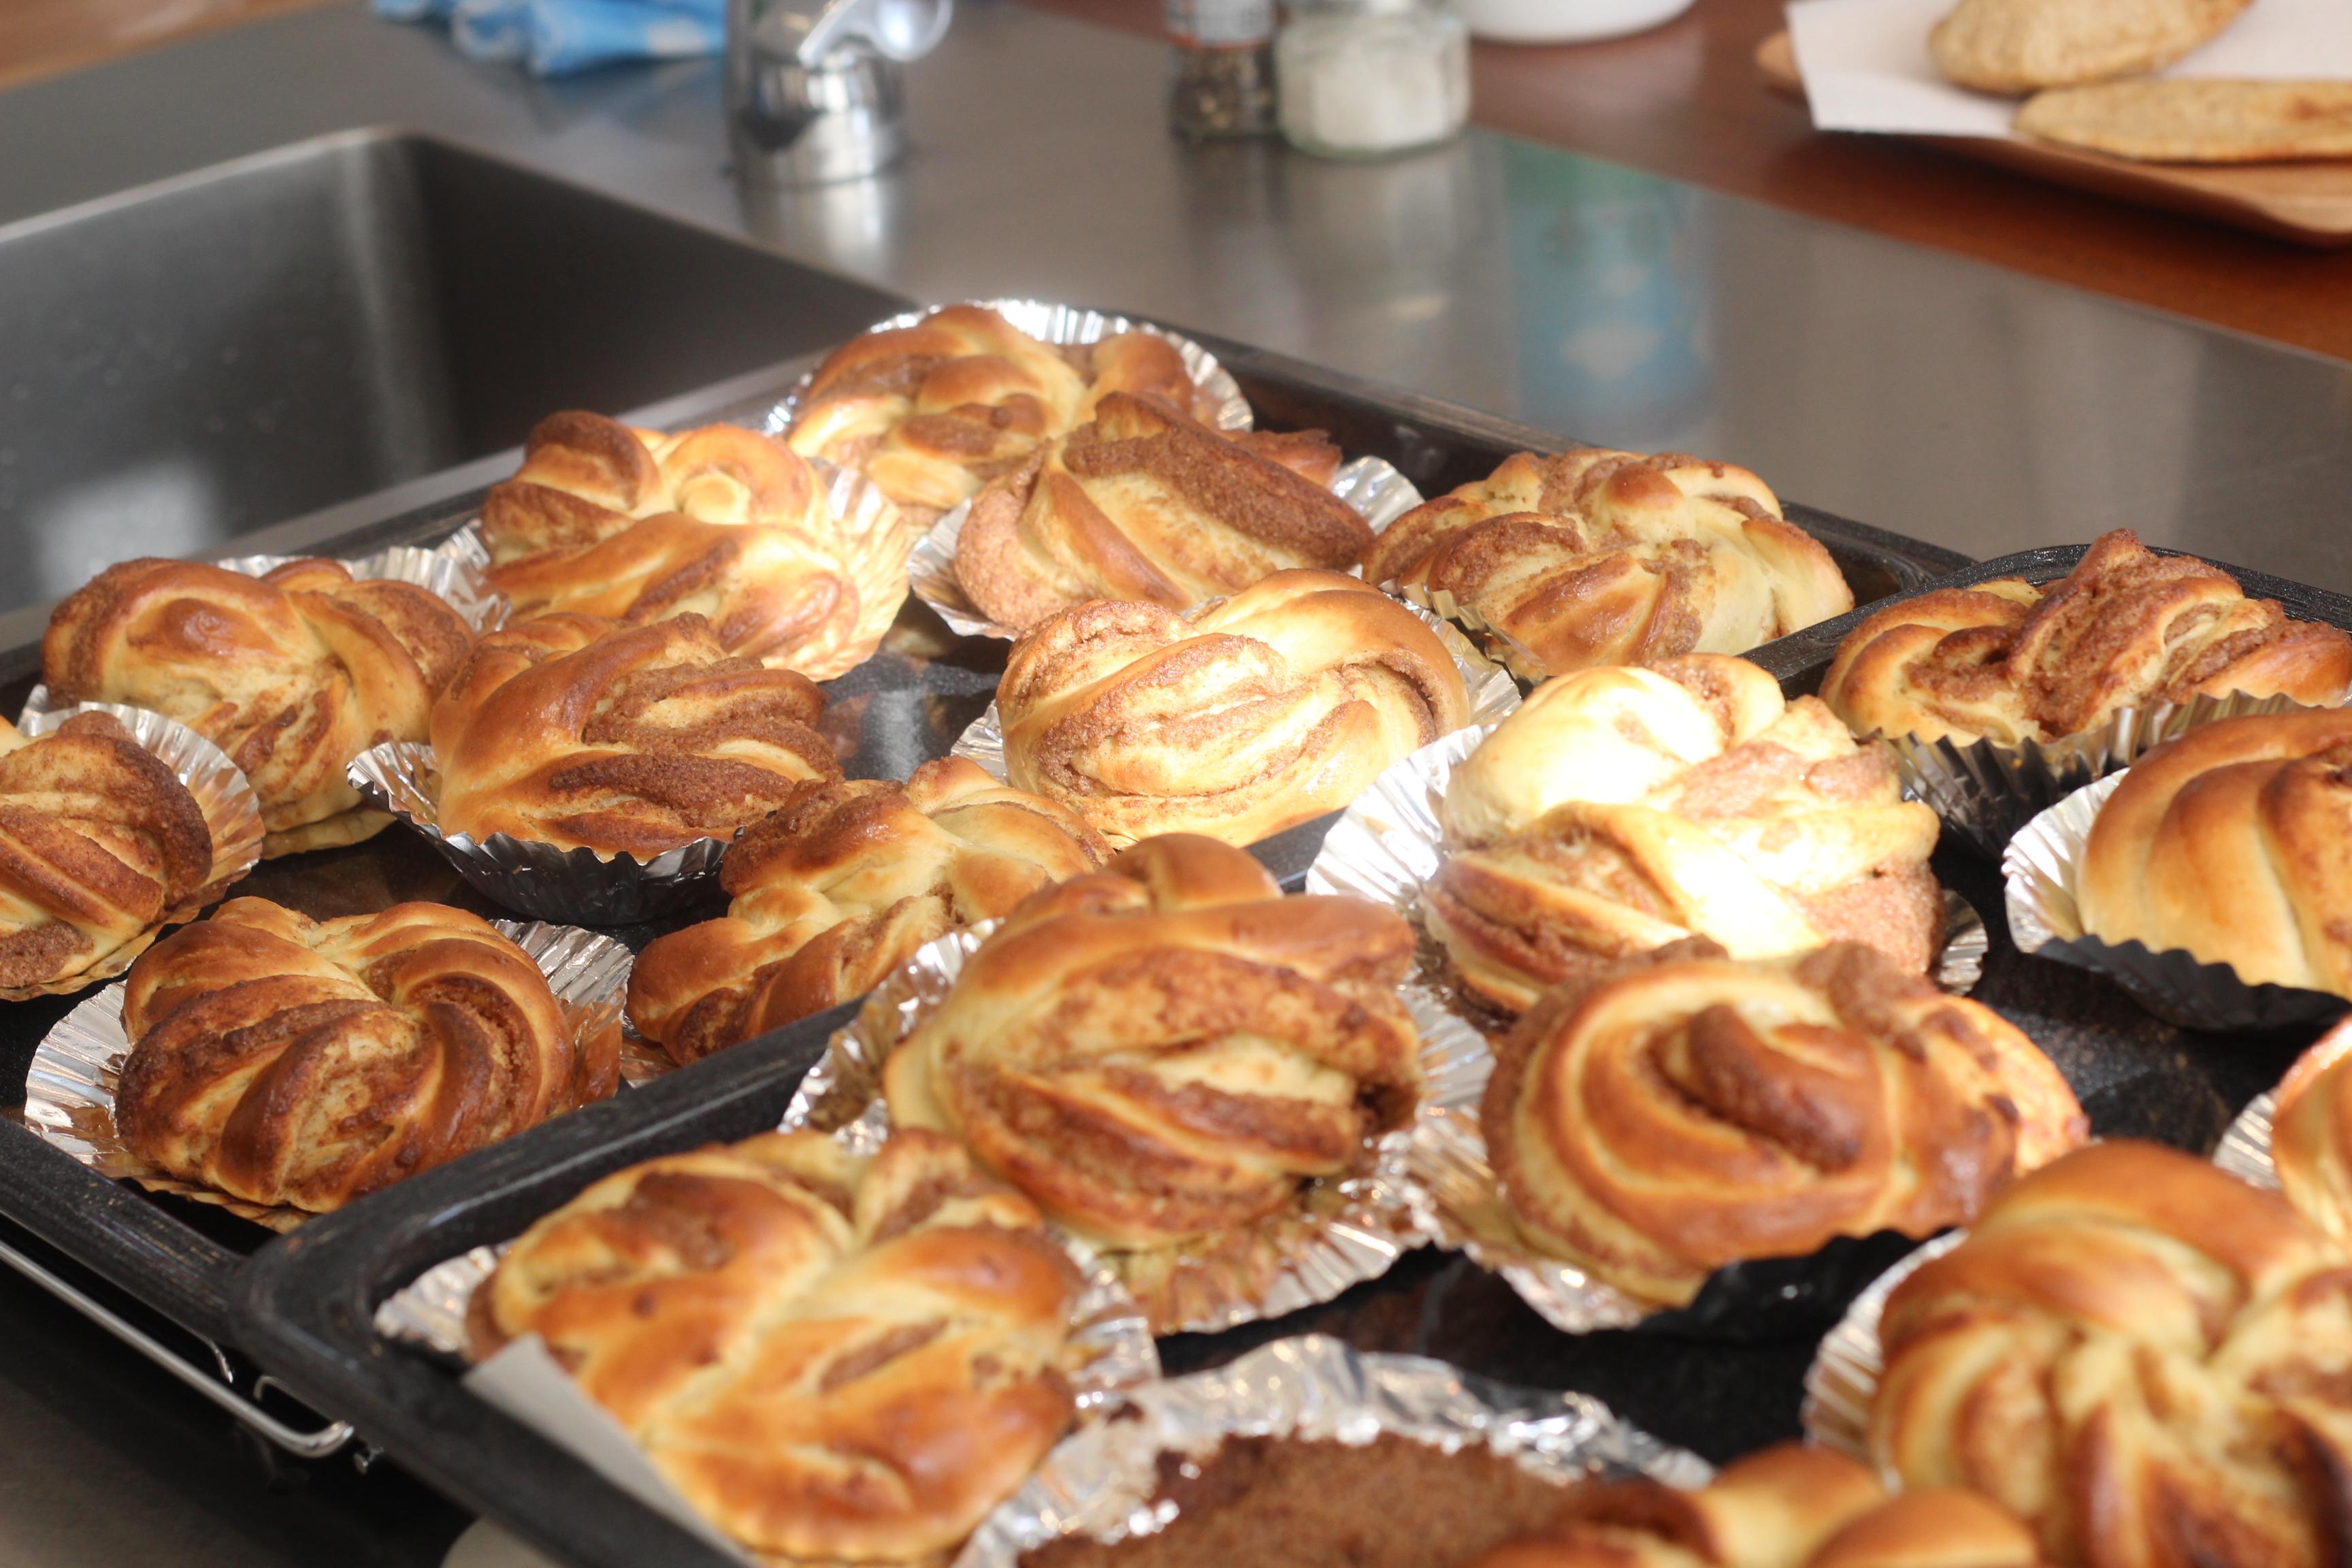 a-ta-sante糖質制限パン料理教室、阿倍野区西田辺。京都江部粉糖質制限パンベーシックコース『シナモンロール&ピタパン』